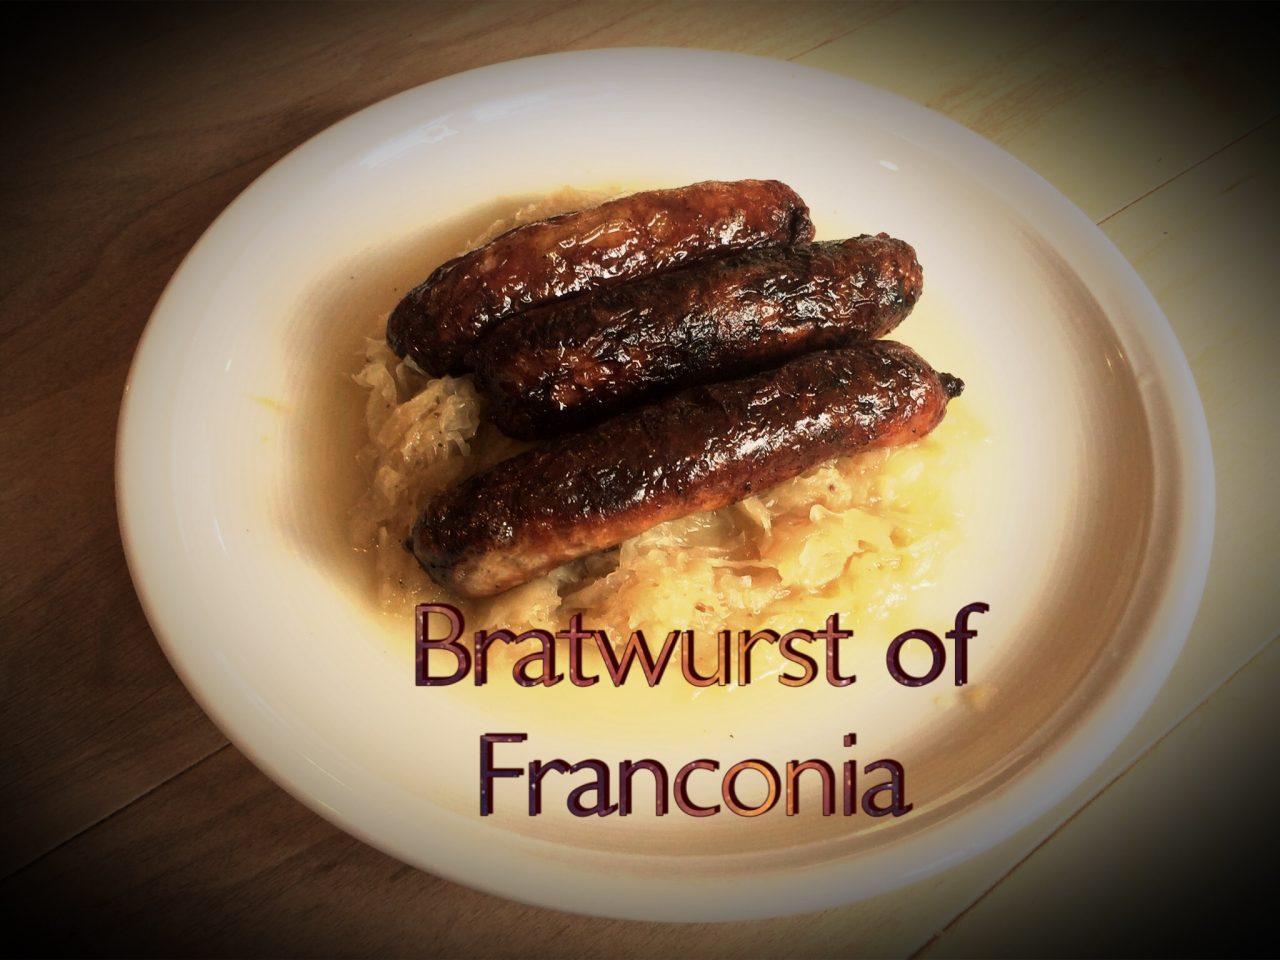 Frankonia Bratwurst